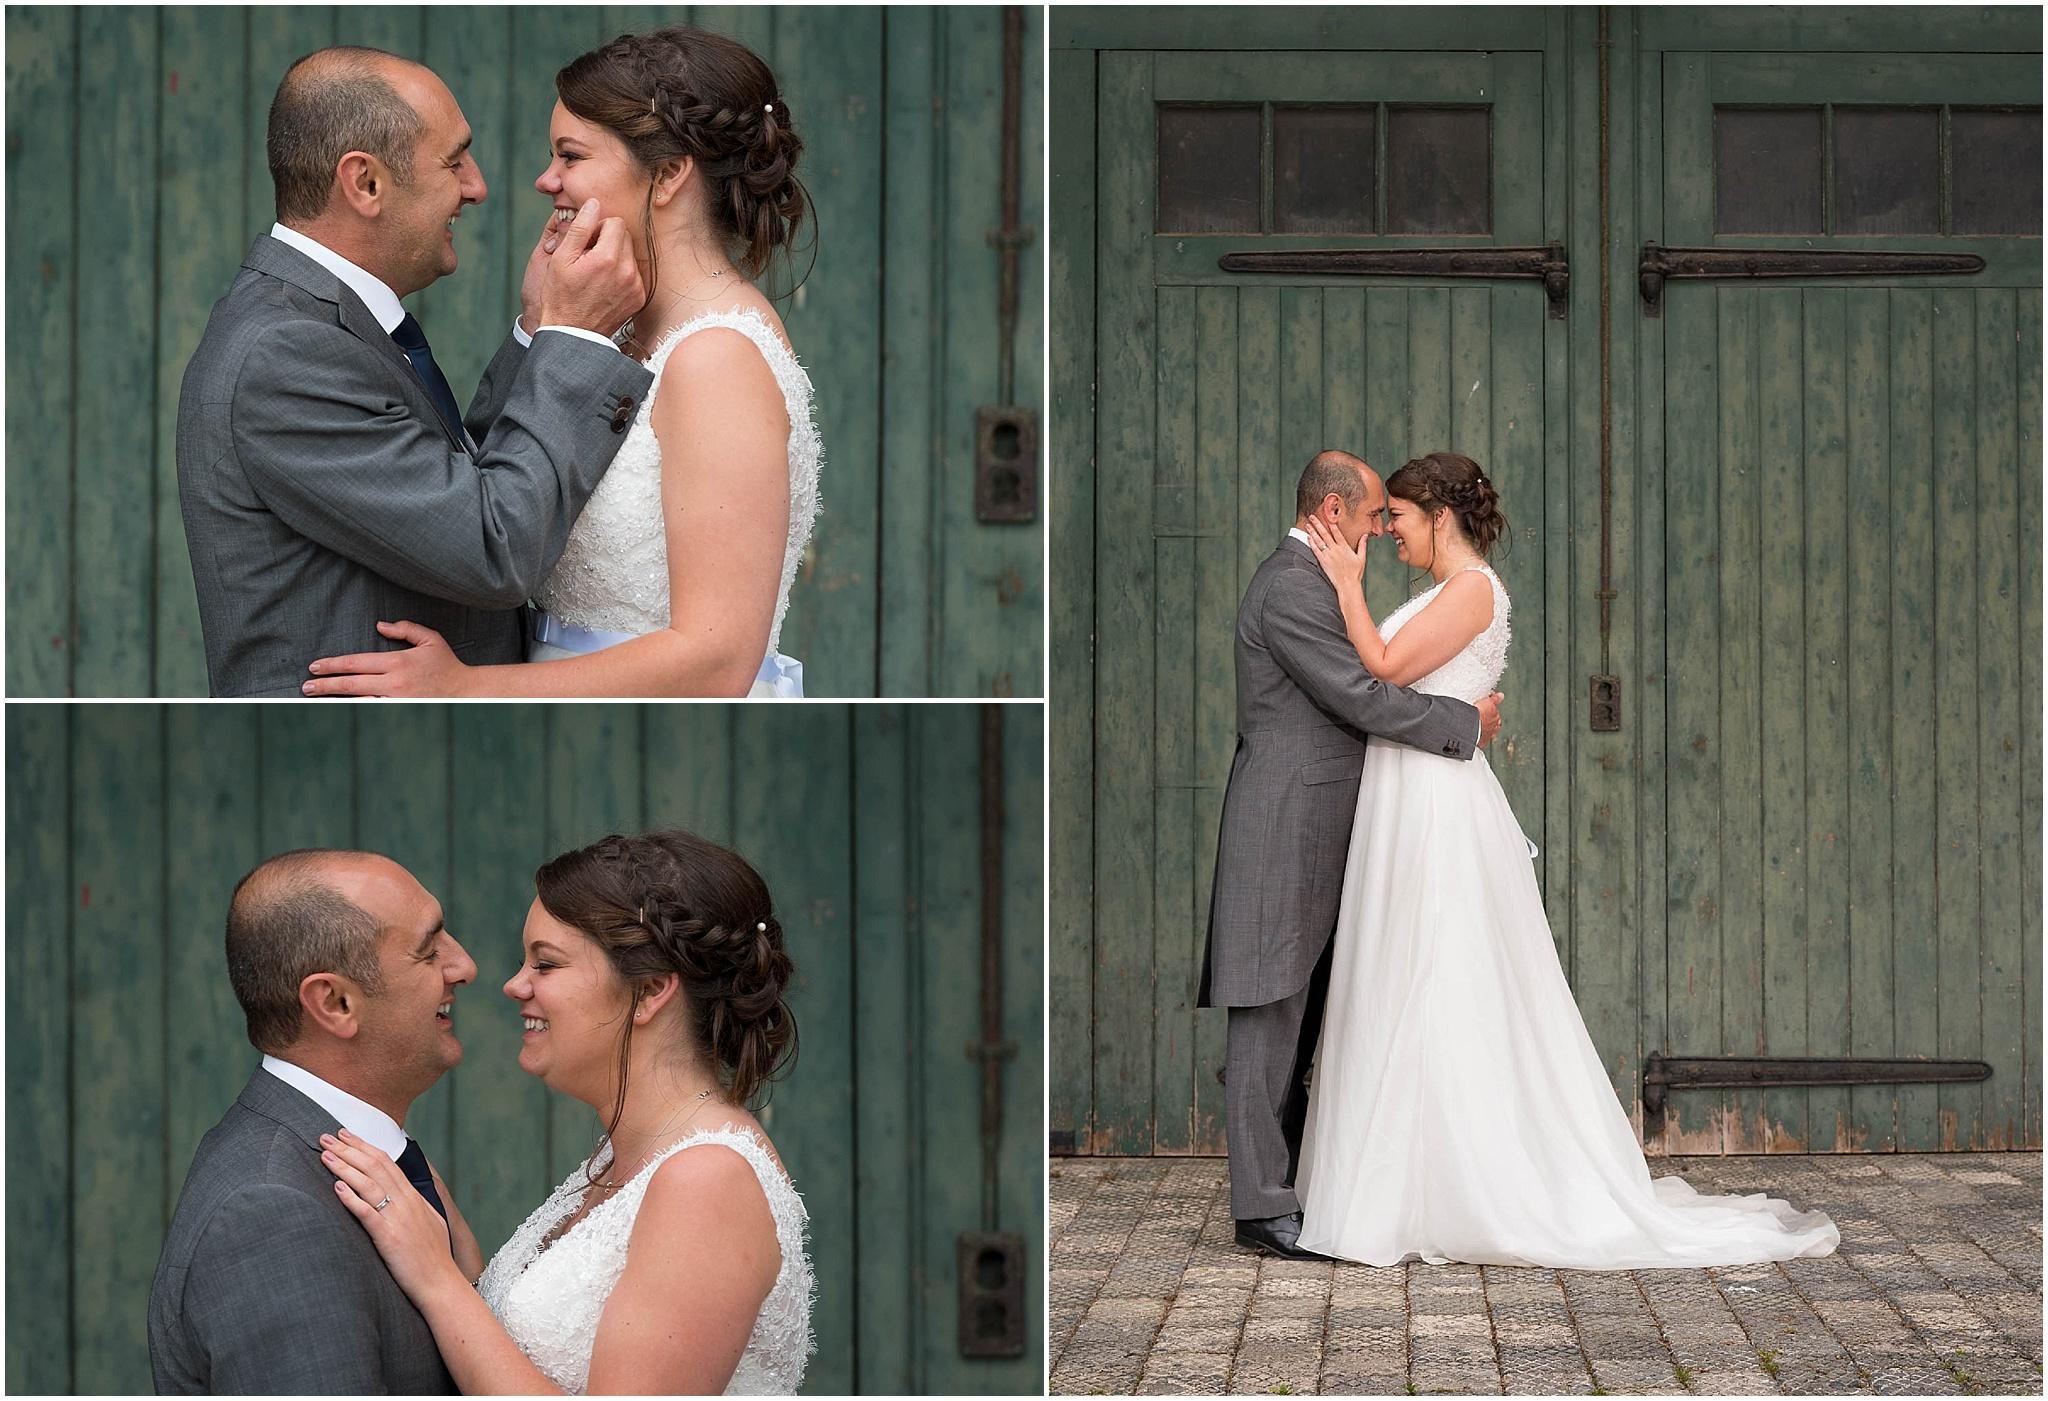 Crathorne Hall Hotel Wedding Photographer97.jpg